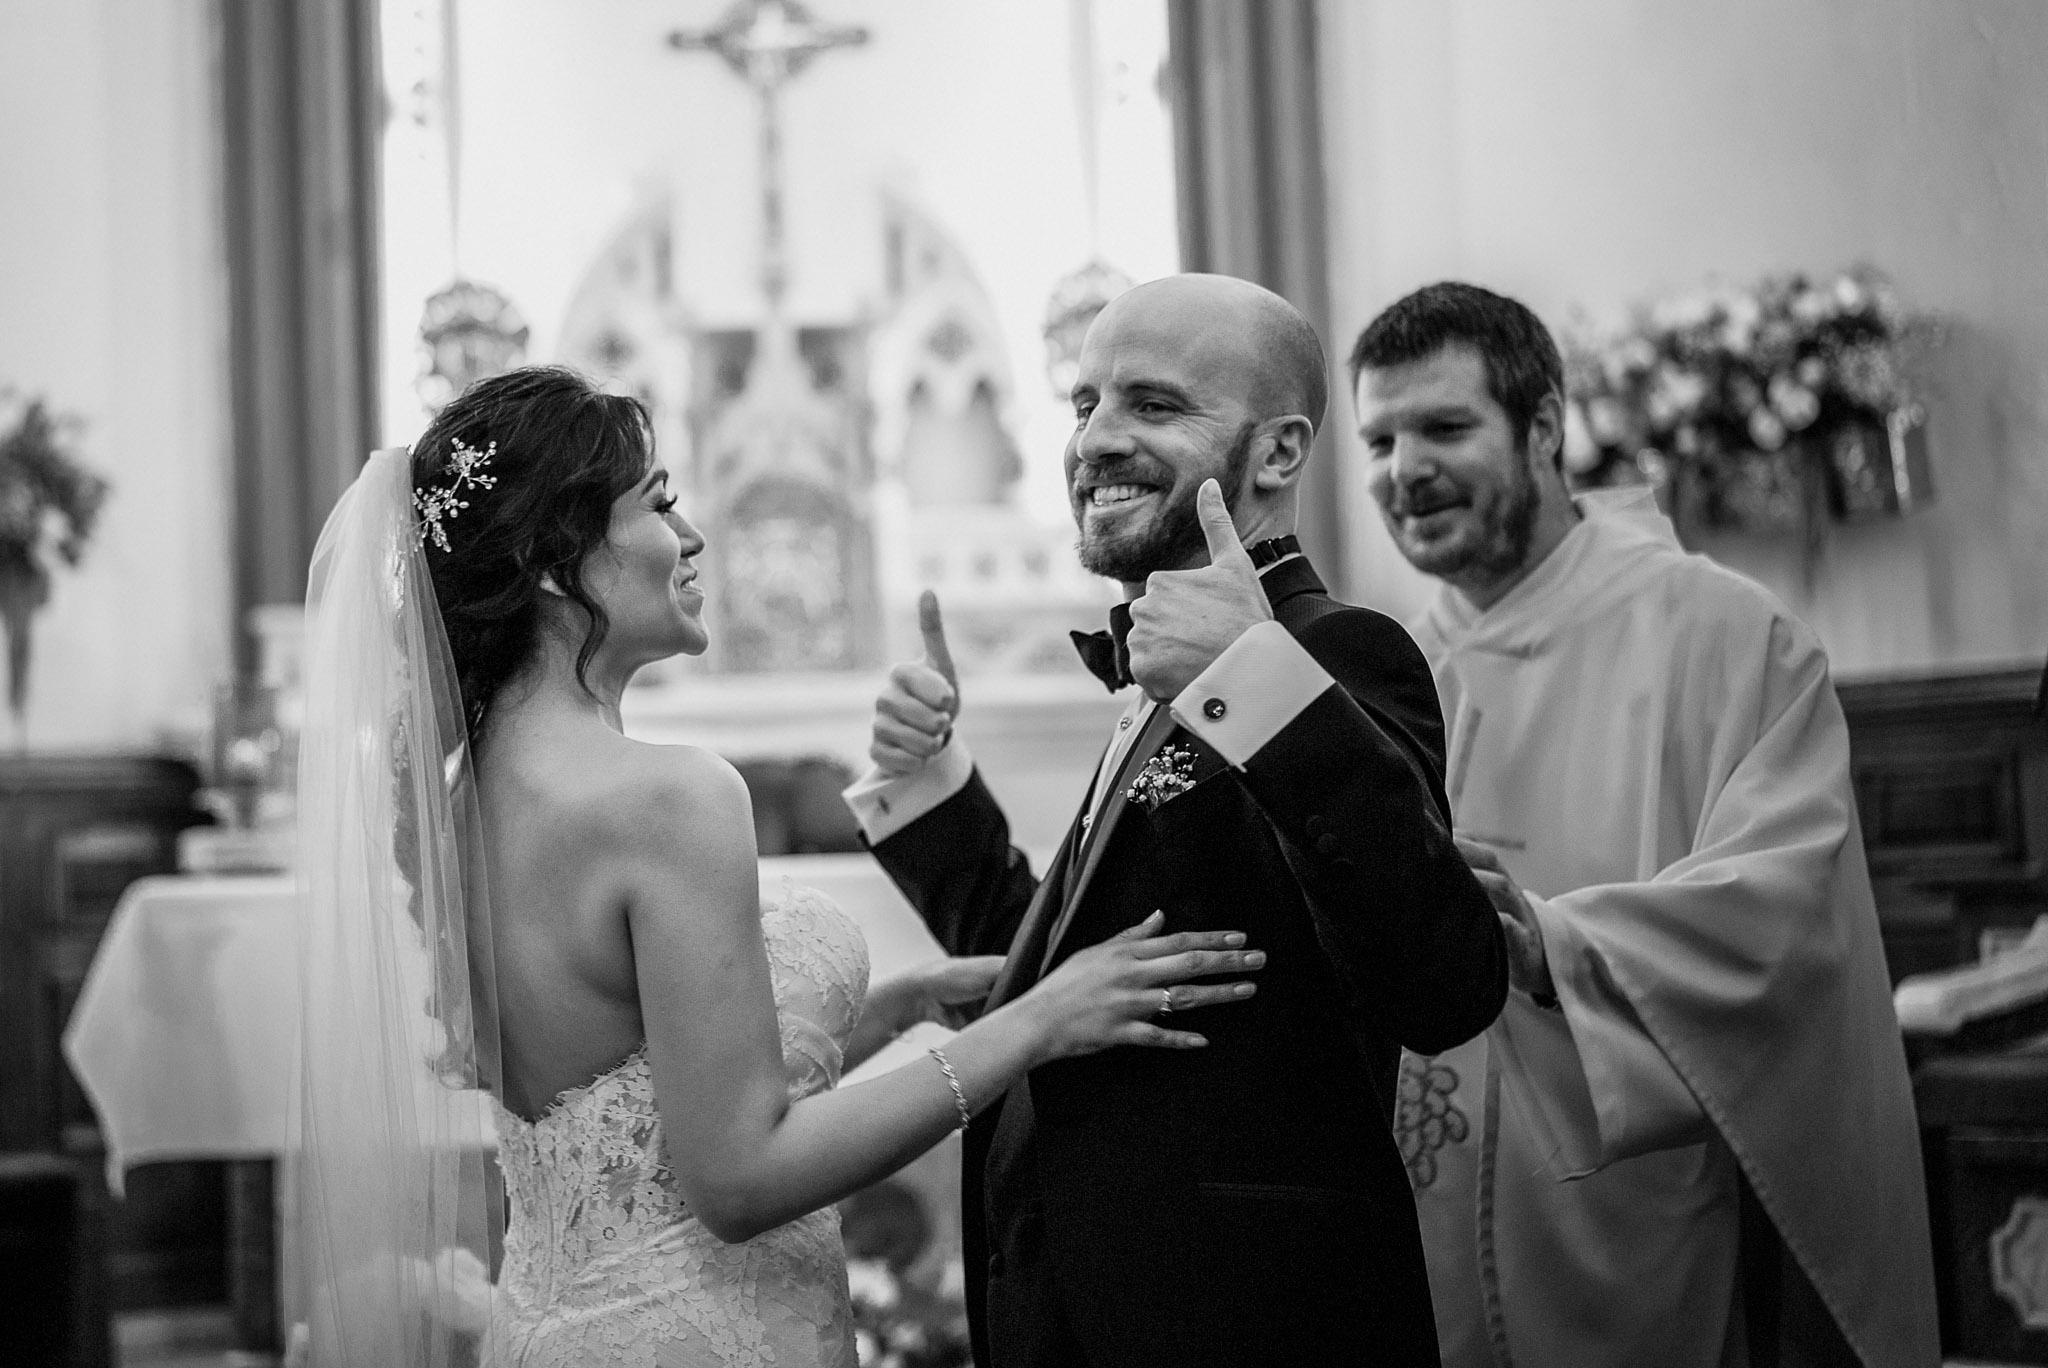 ©www.mauriziosolisbroca.com-20161001maurizio-solis-broca-mexico-canada-wedding-photographer20161001DSC07904-Edit.jpg